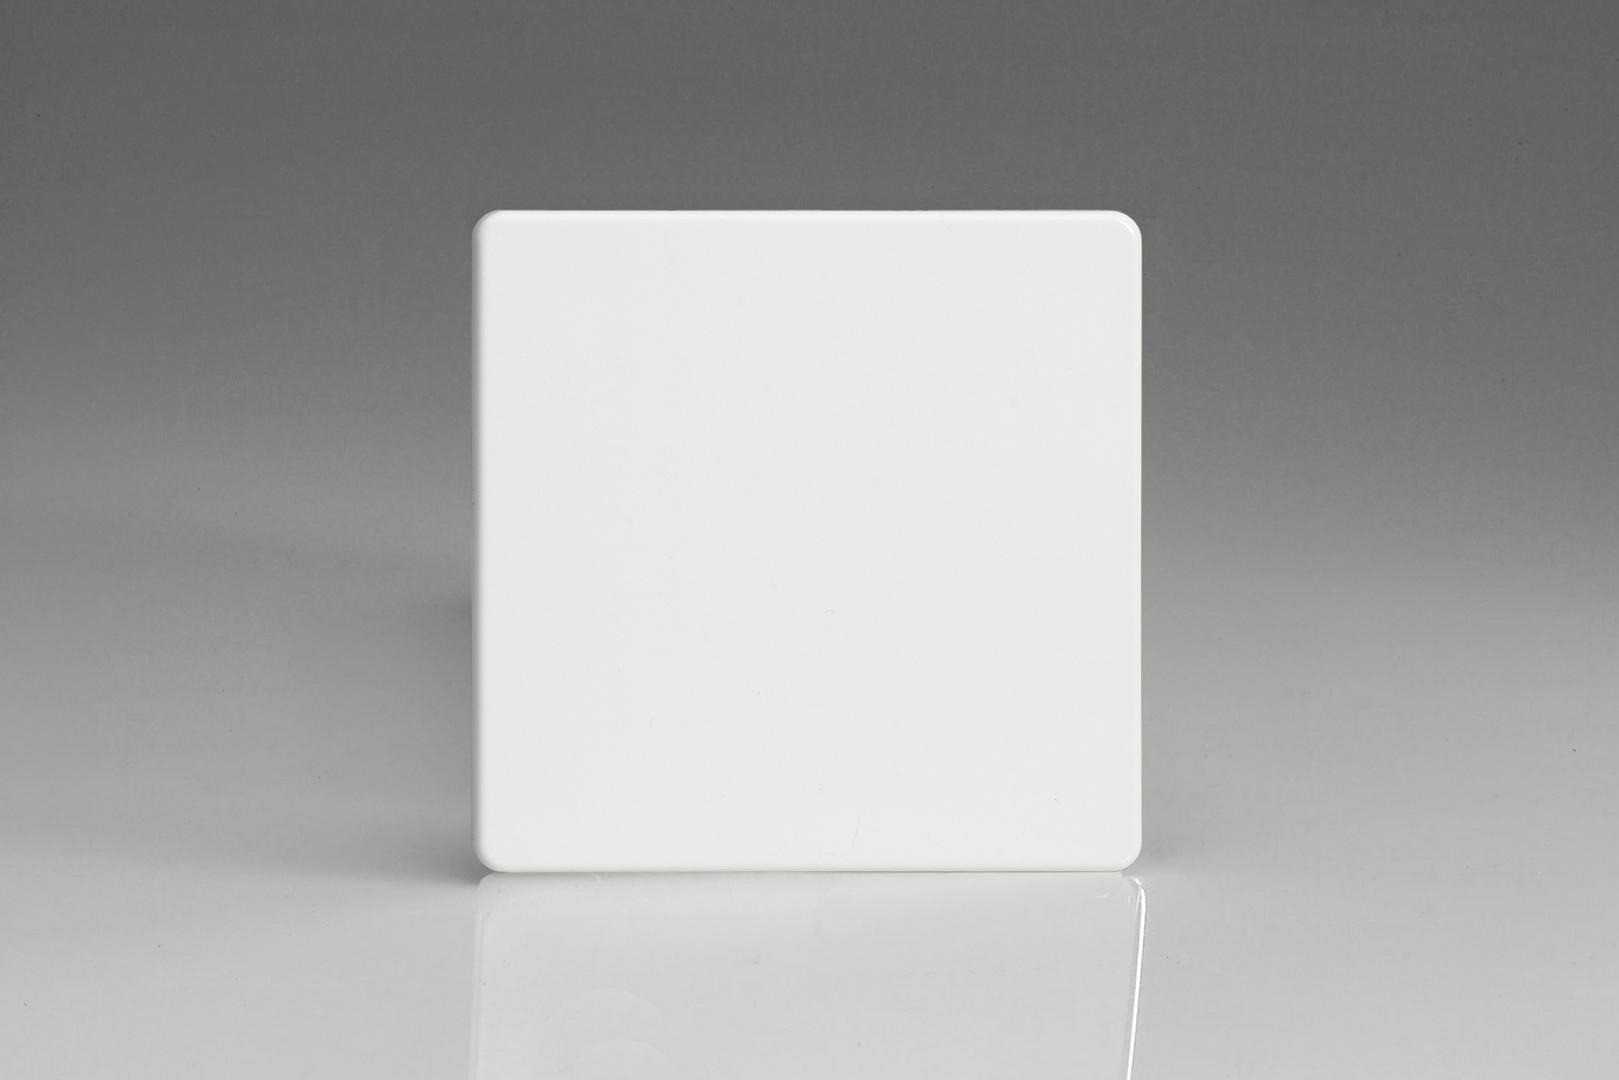 Screwless Premium White